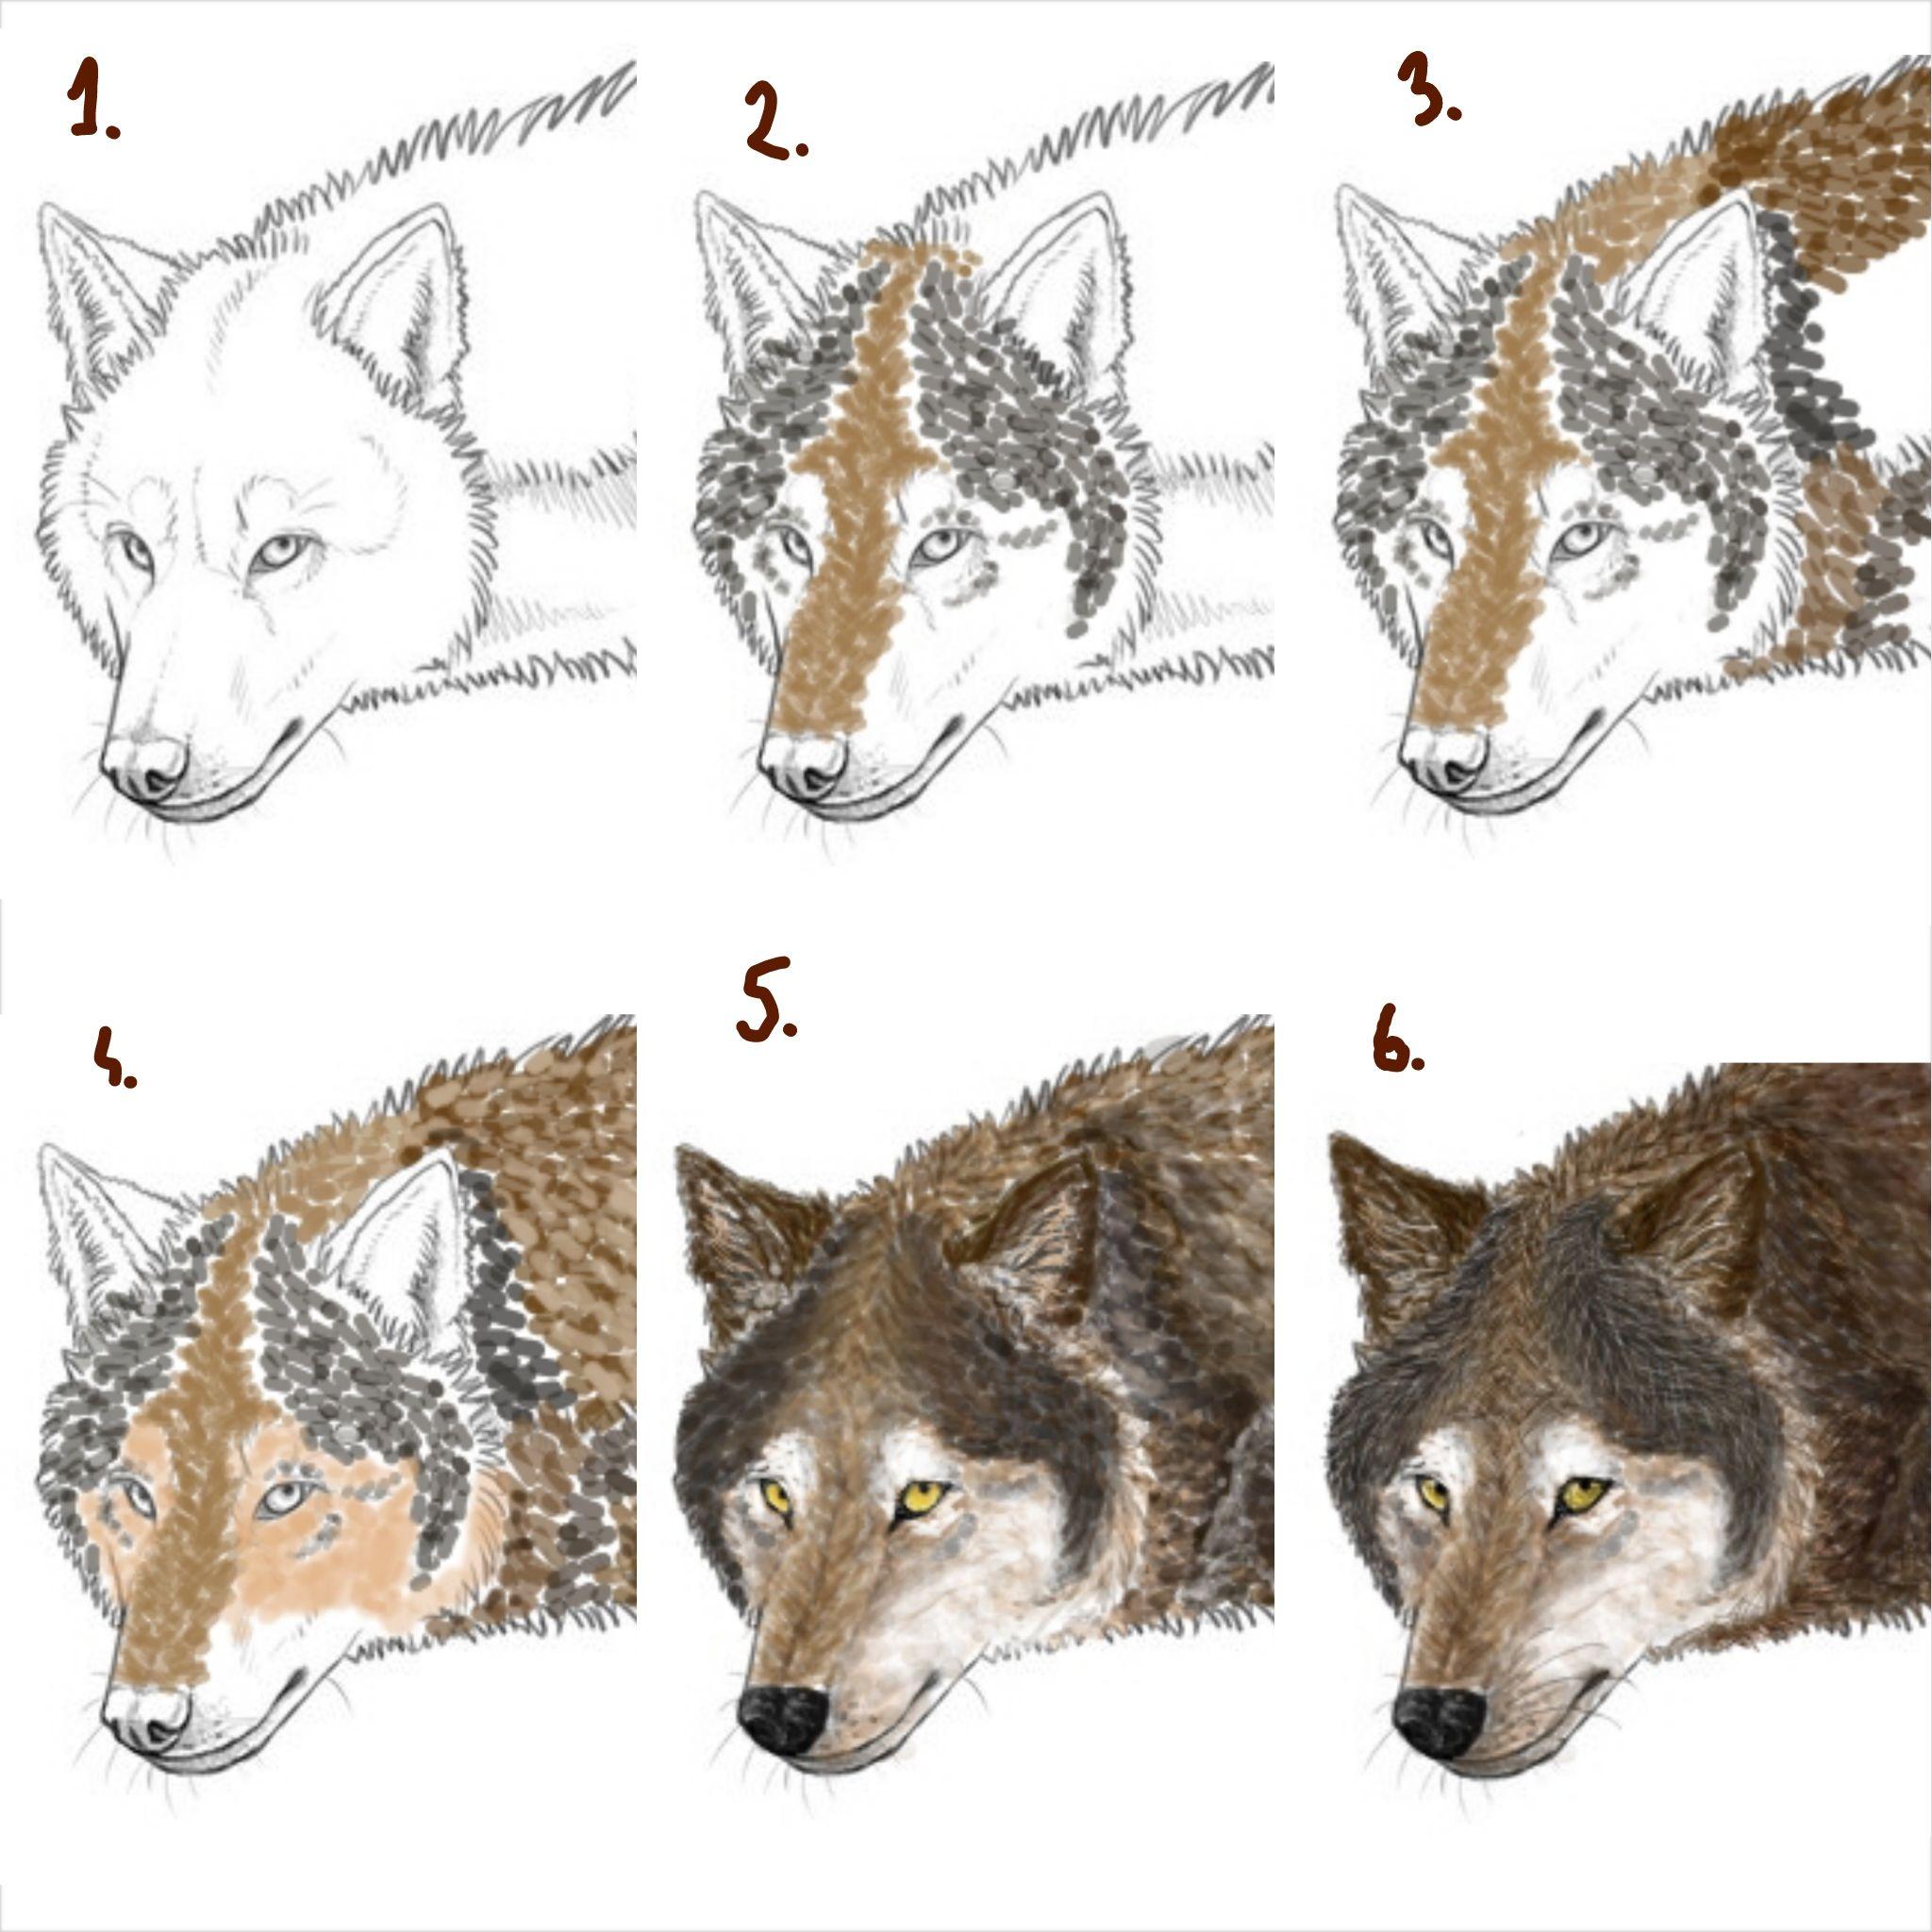 Picsart Painting Tutorialwolf By Thedeadlydragoniantart On  @deviantart · Wolf Paintingpainting Stepsinspirational Poemspainting  Tutorialsdrawing